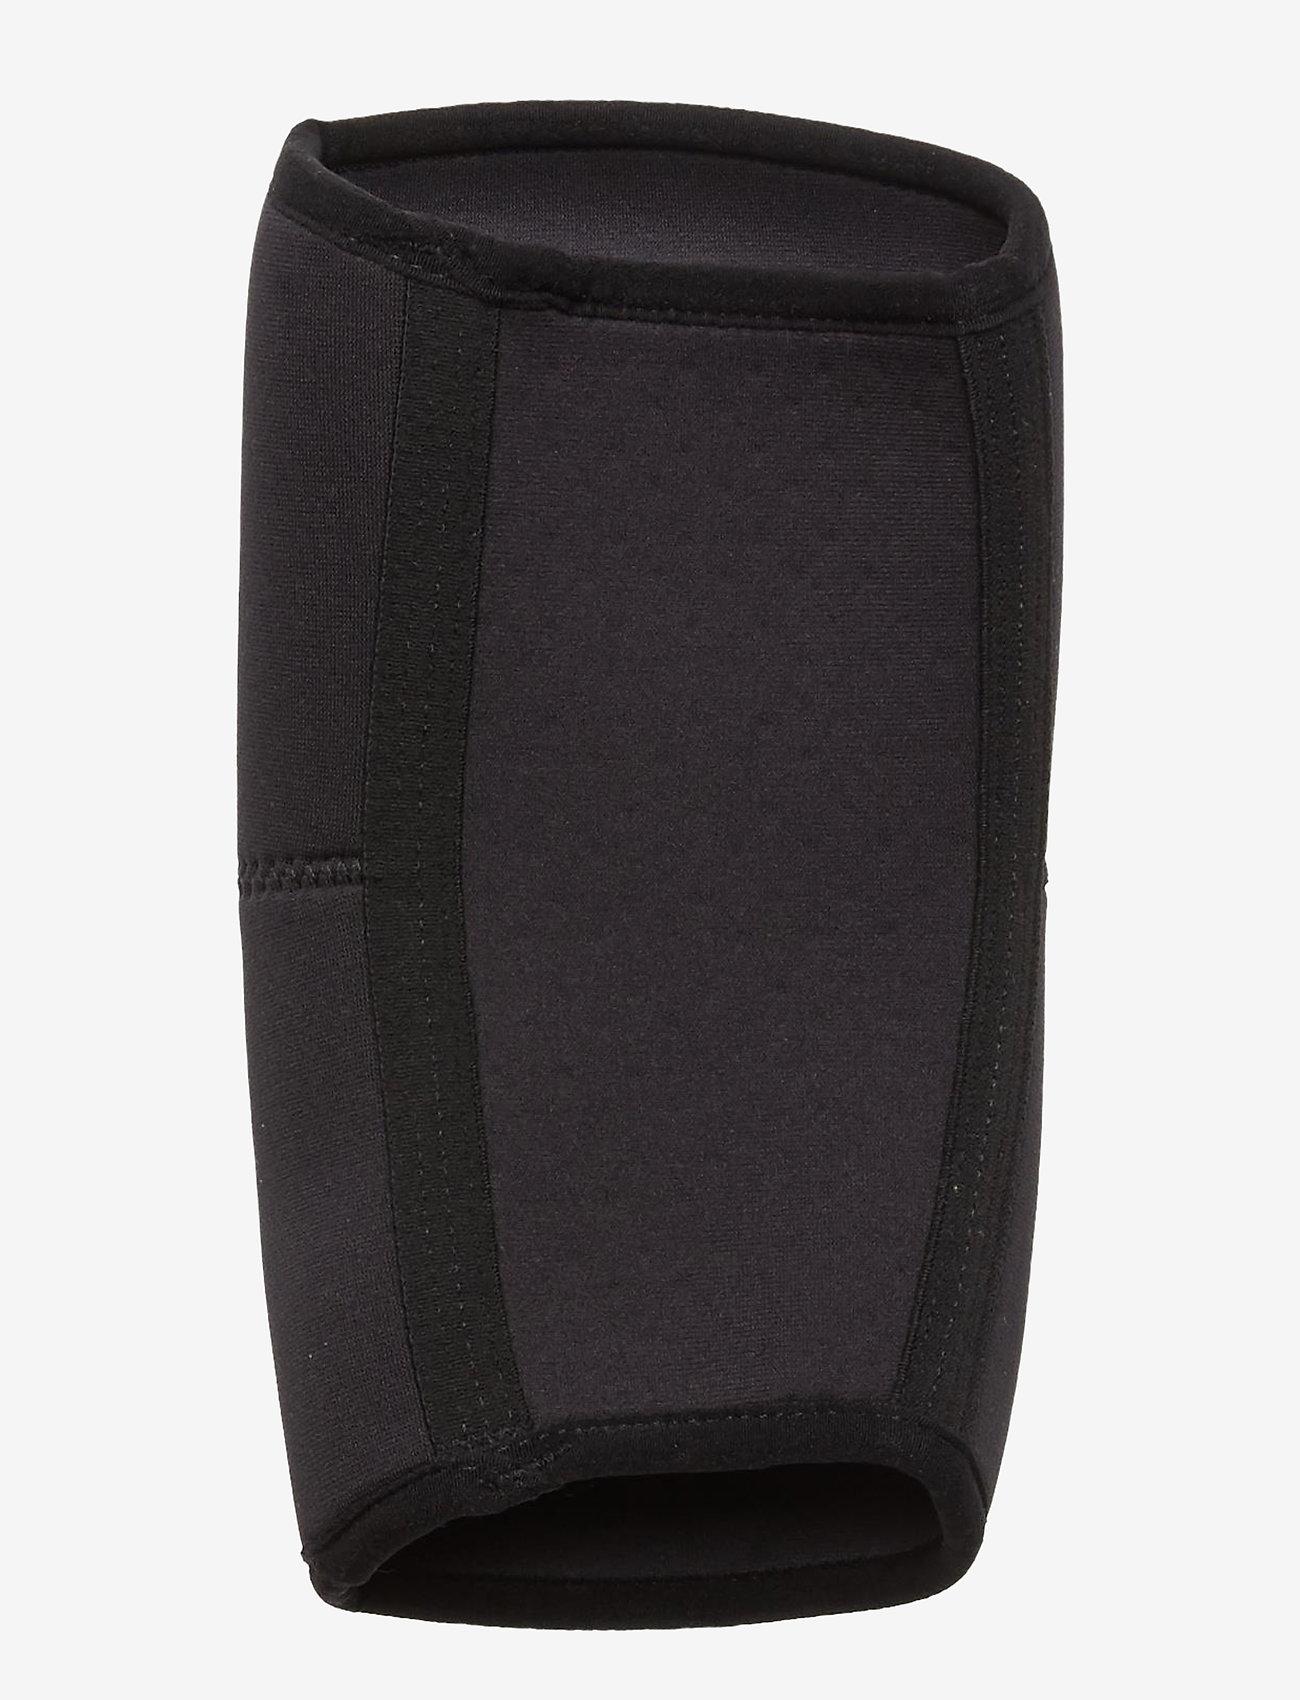 Endurance - PROTECH Neoprene Open Knee Support - knee support - 1001 black - 1